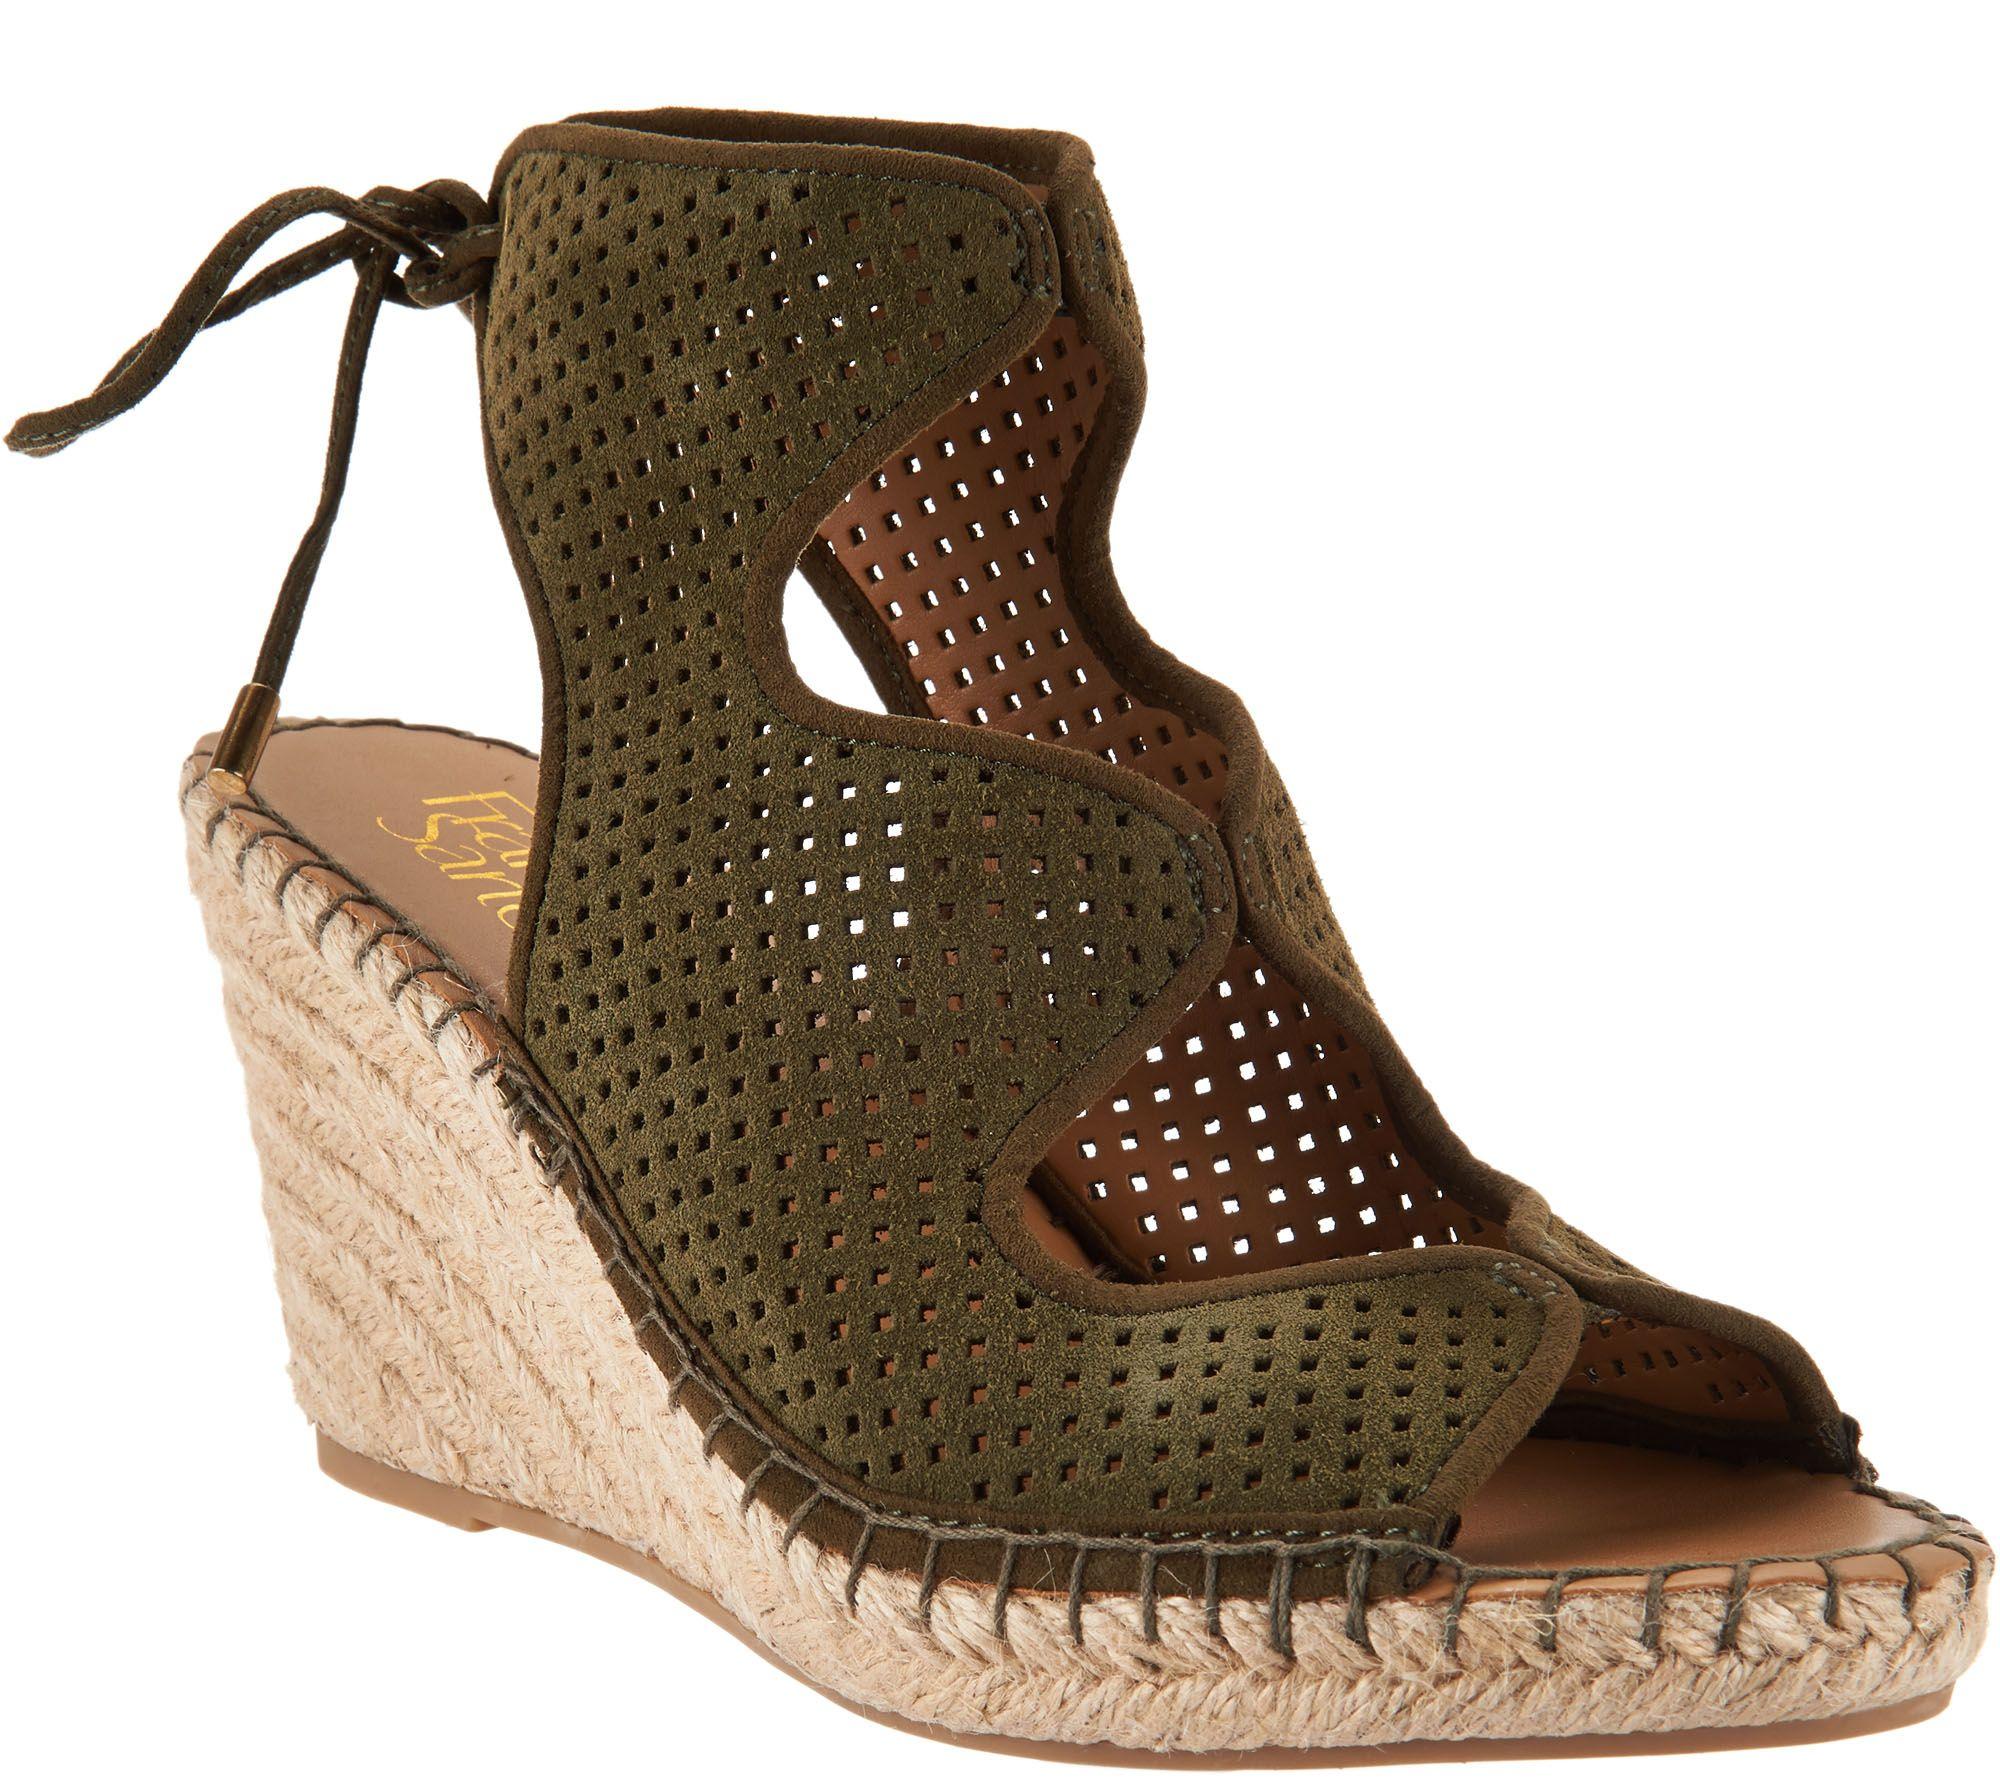 Black dress sandals medium heel - Franco Sarto Perforated Suede Espadrille Wedges Nash A290986